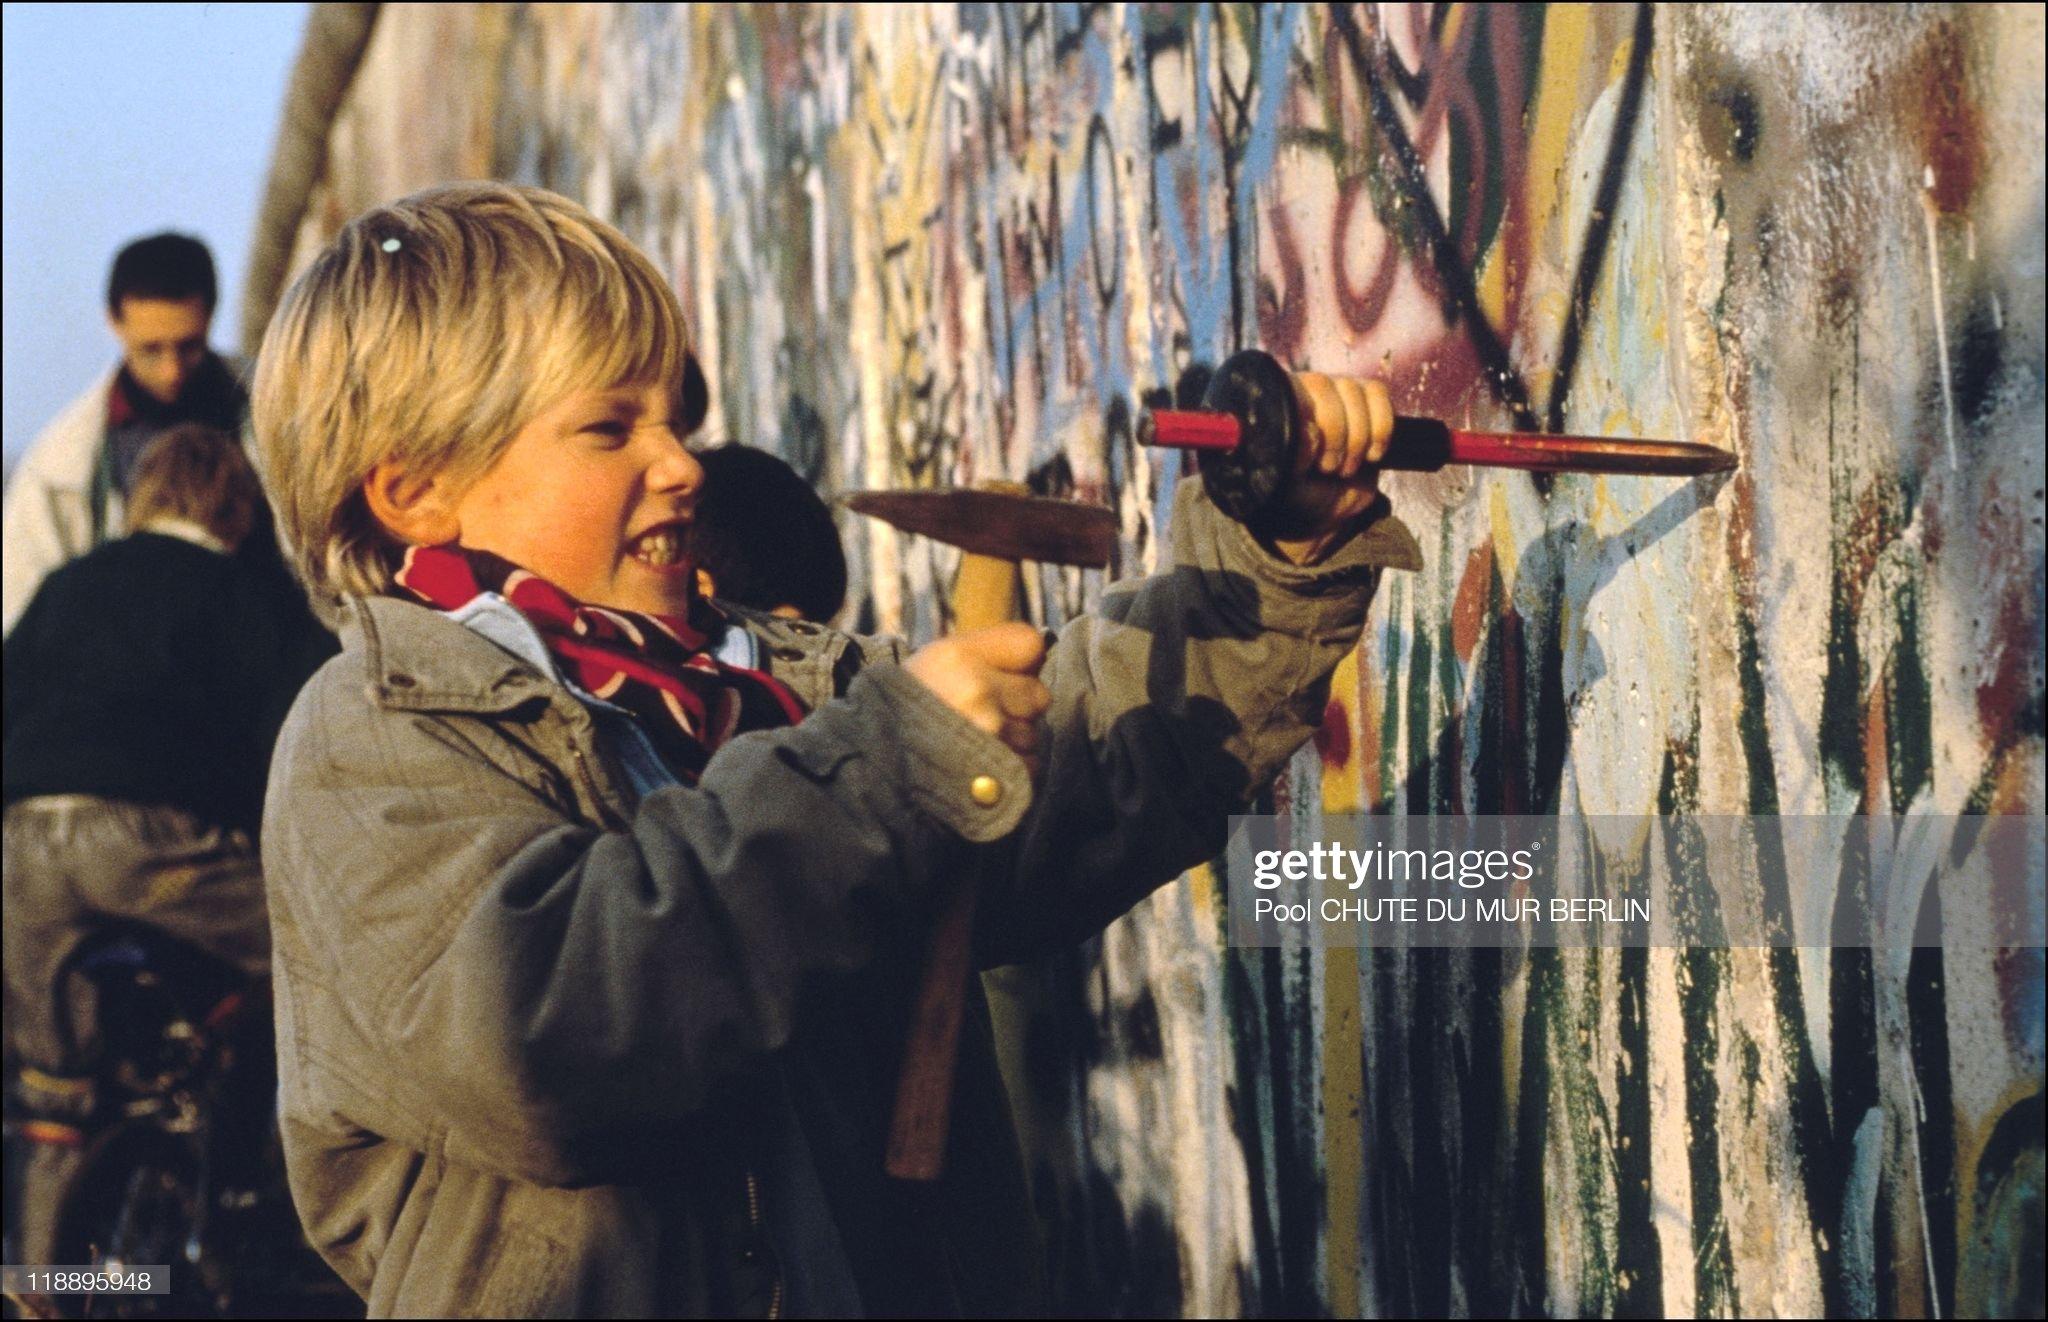 Opening Of The Berlin Wall In Berlin In 1989 : Nieuwsfoto's